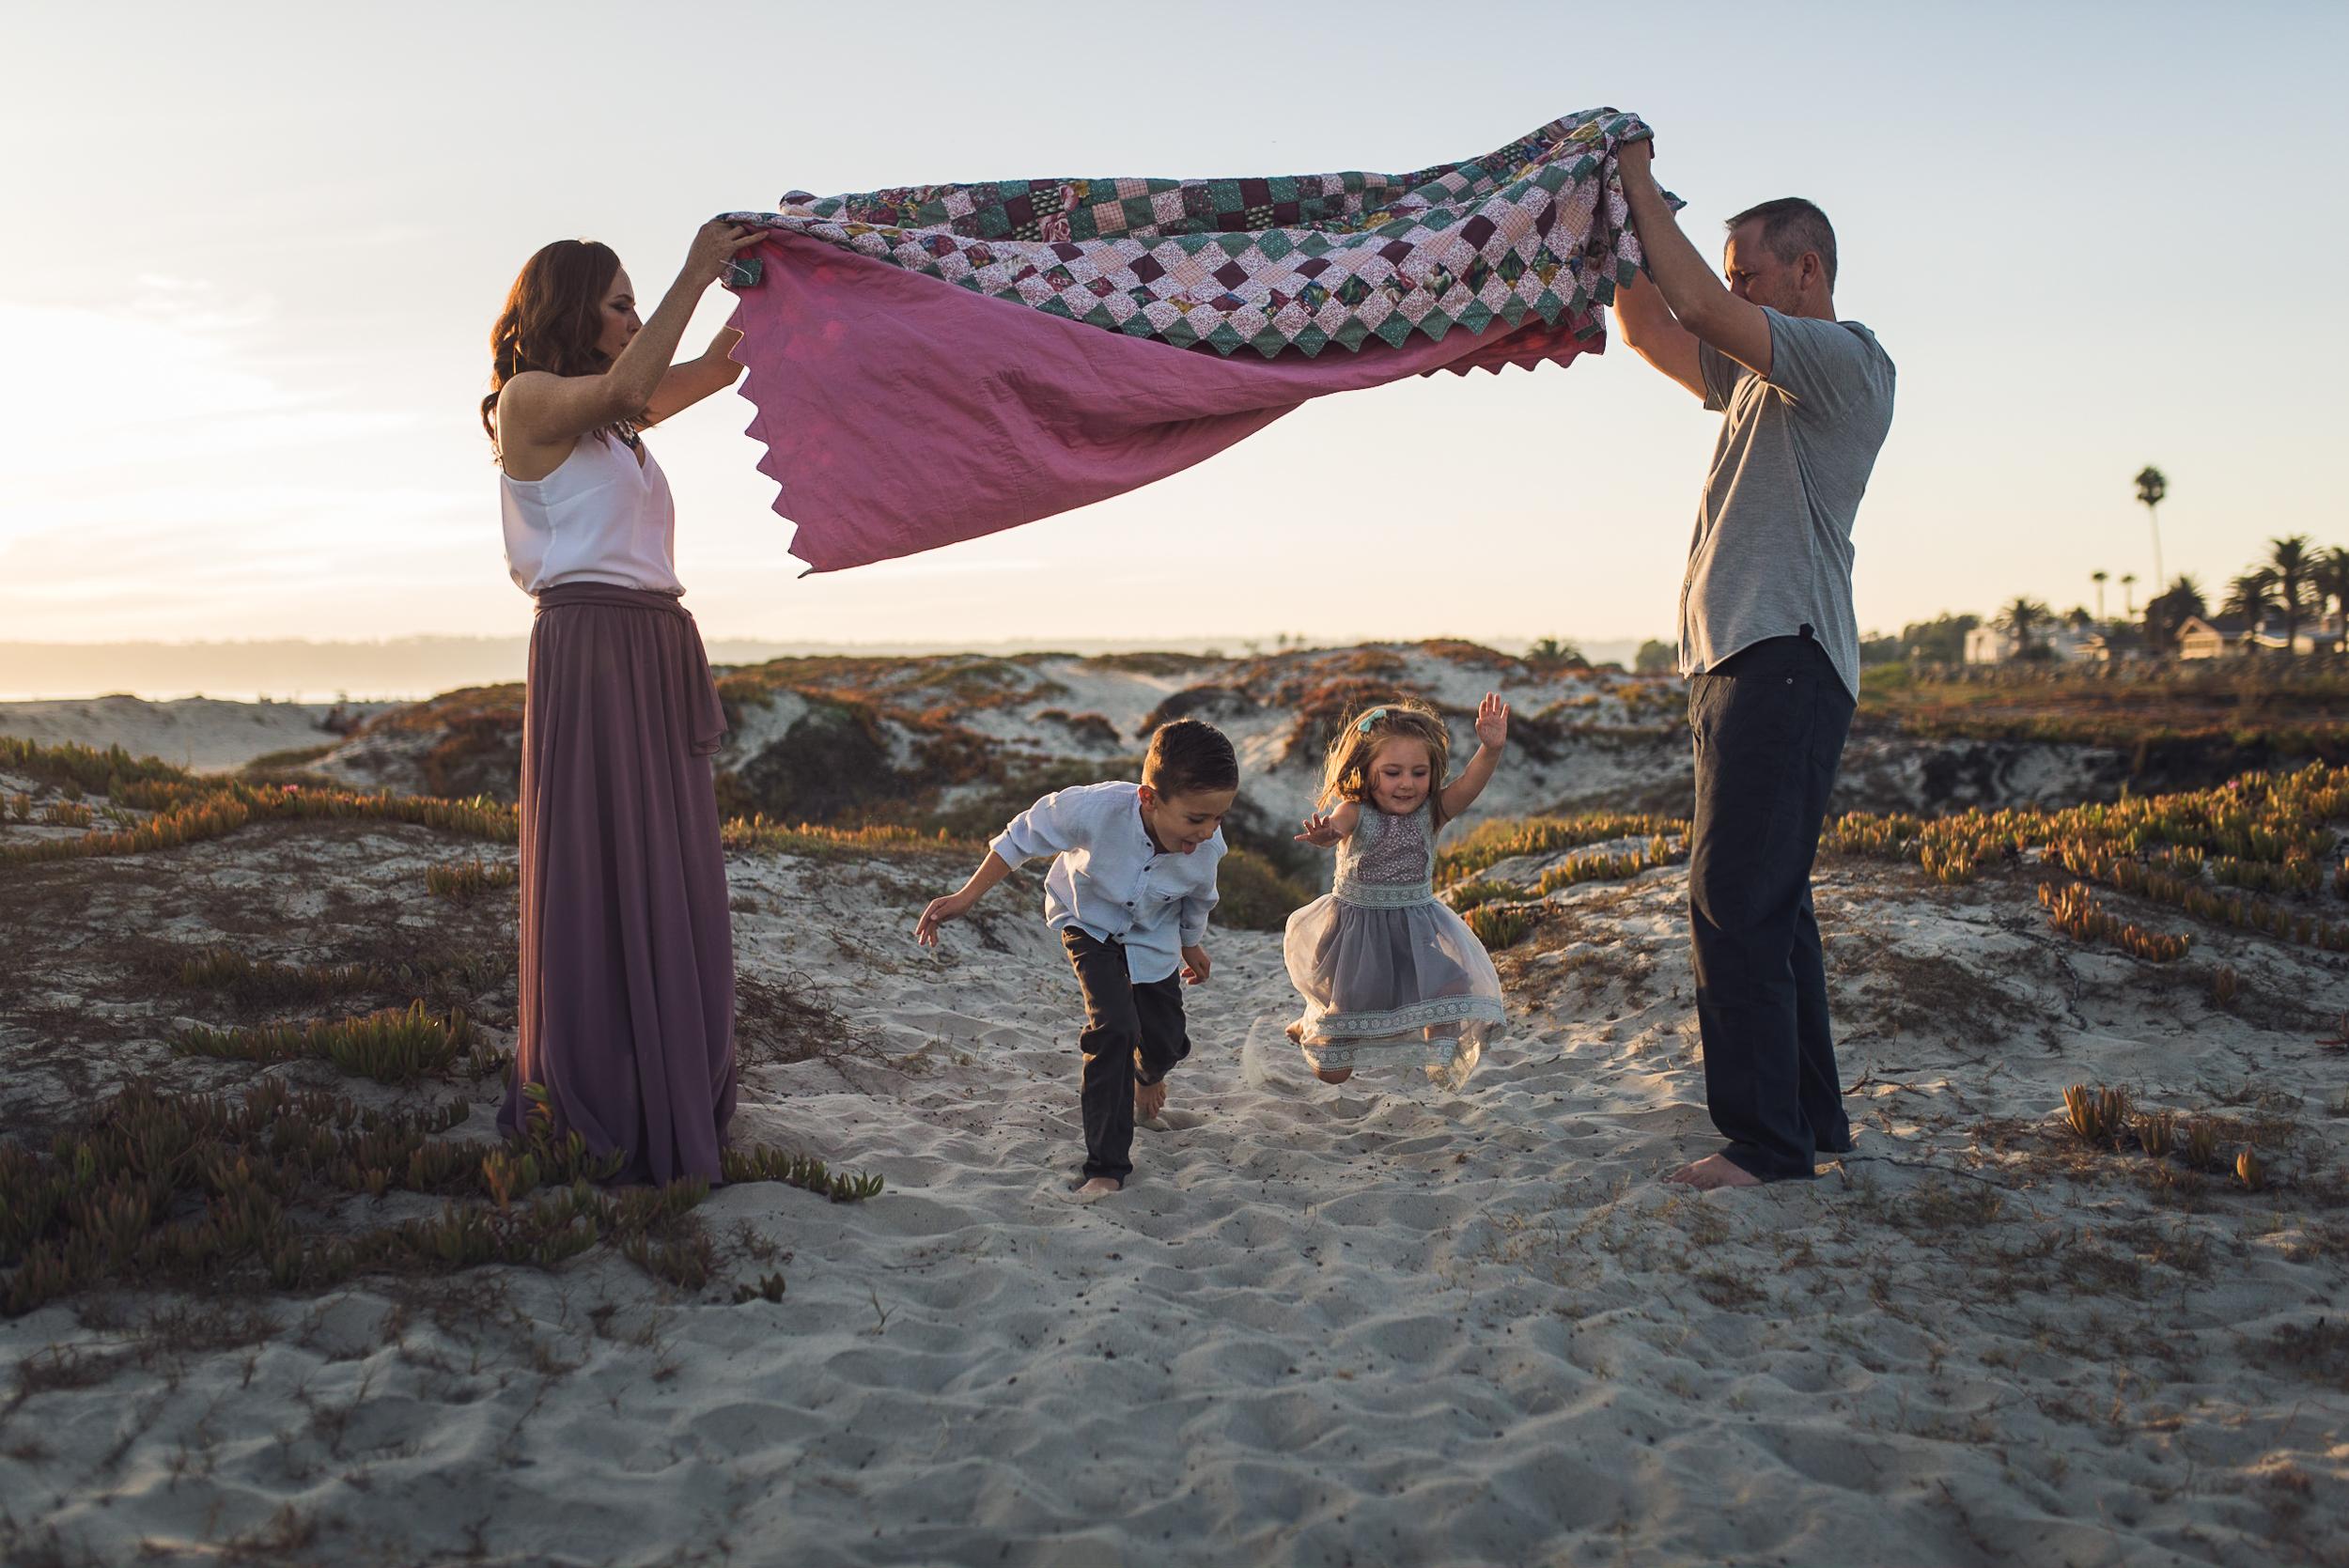 2018-San-Diego-Family-Lifestyle-Newborn-Travel-Vacation-Photographer-Kelsey-Smith-Photography-Coronado-La-Jolla-Encinitas-Solana-Beach-Del-Mar-187.jpg